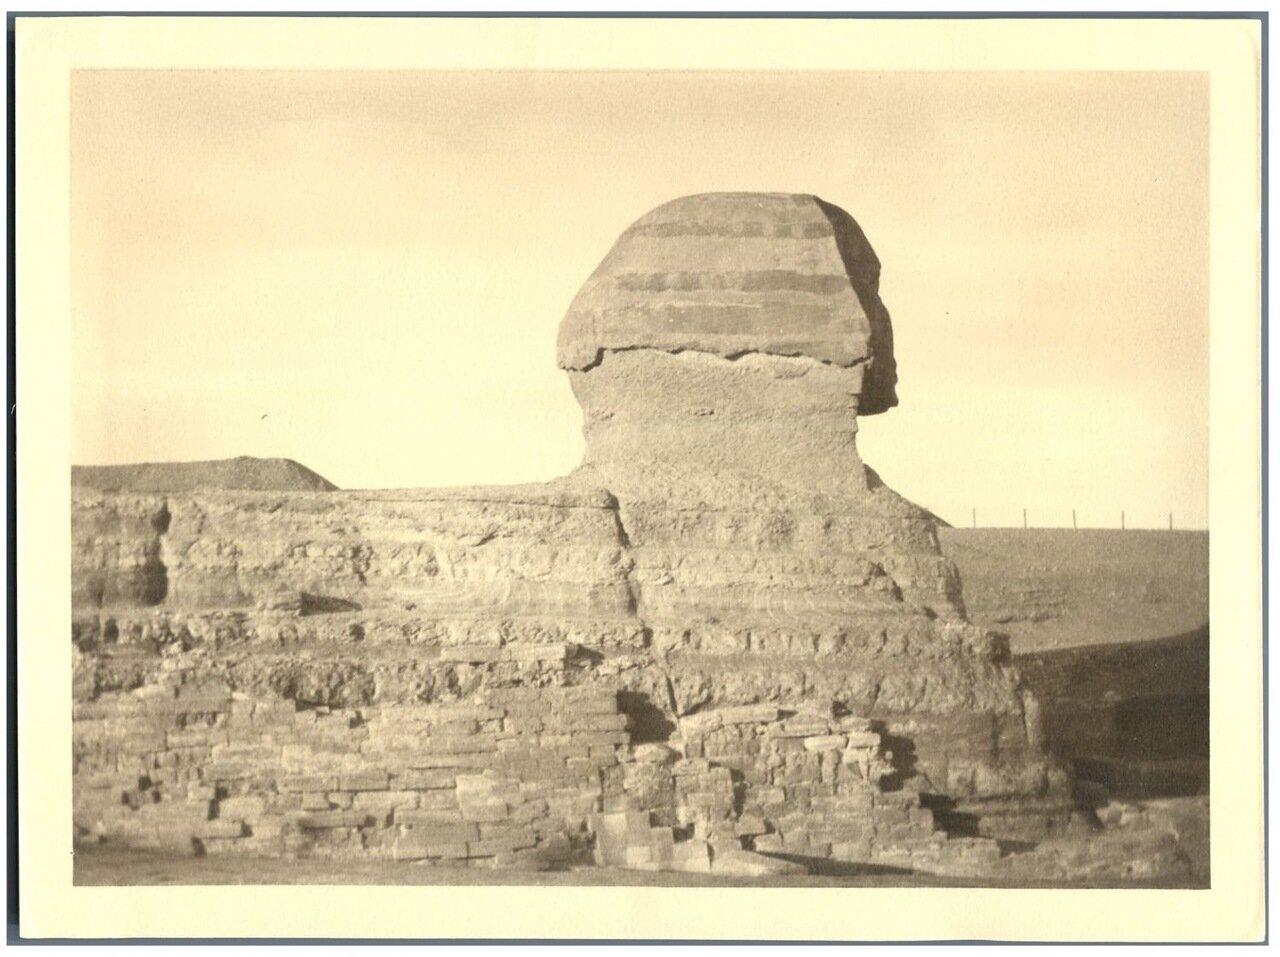 Гиза. Сфинкс. 1875.